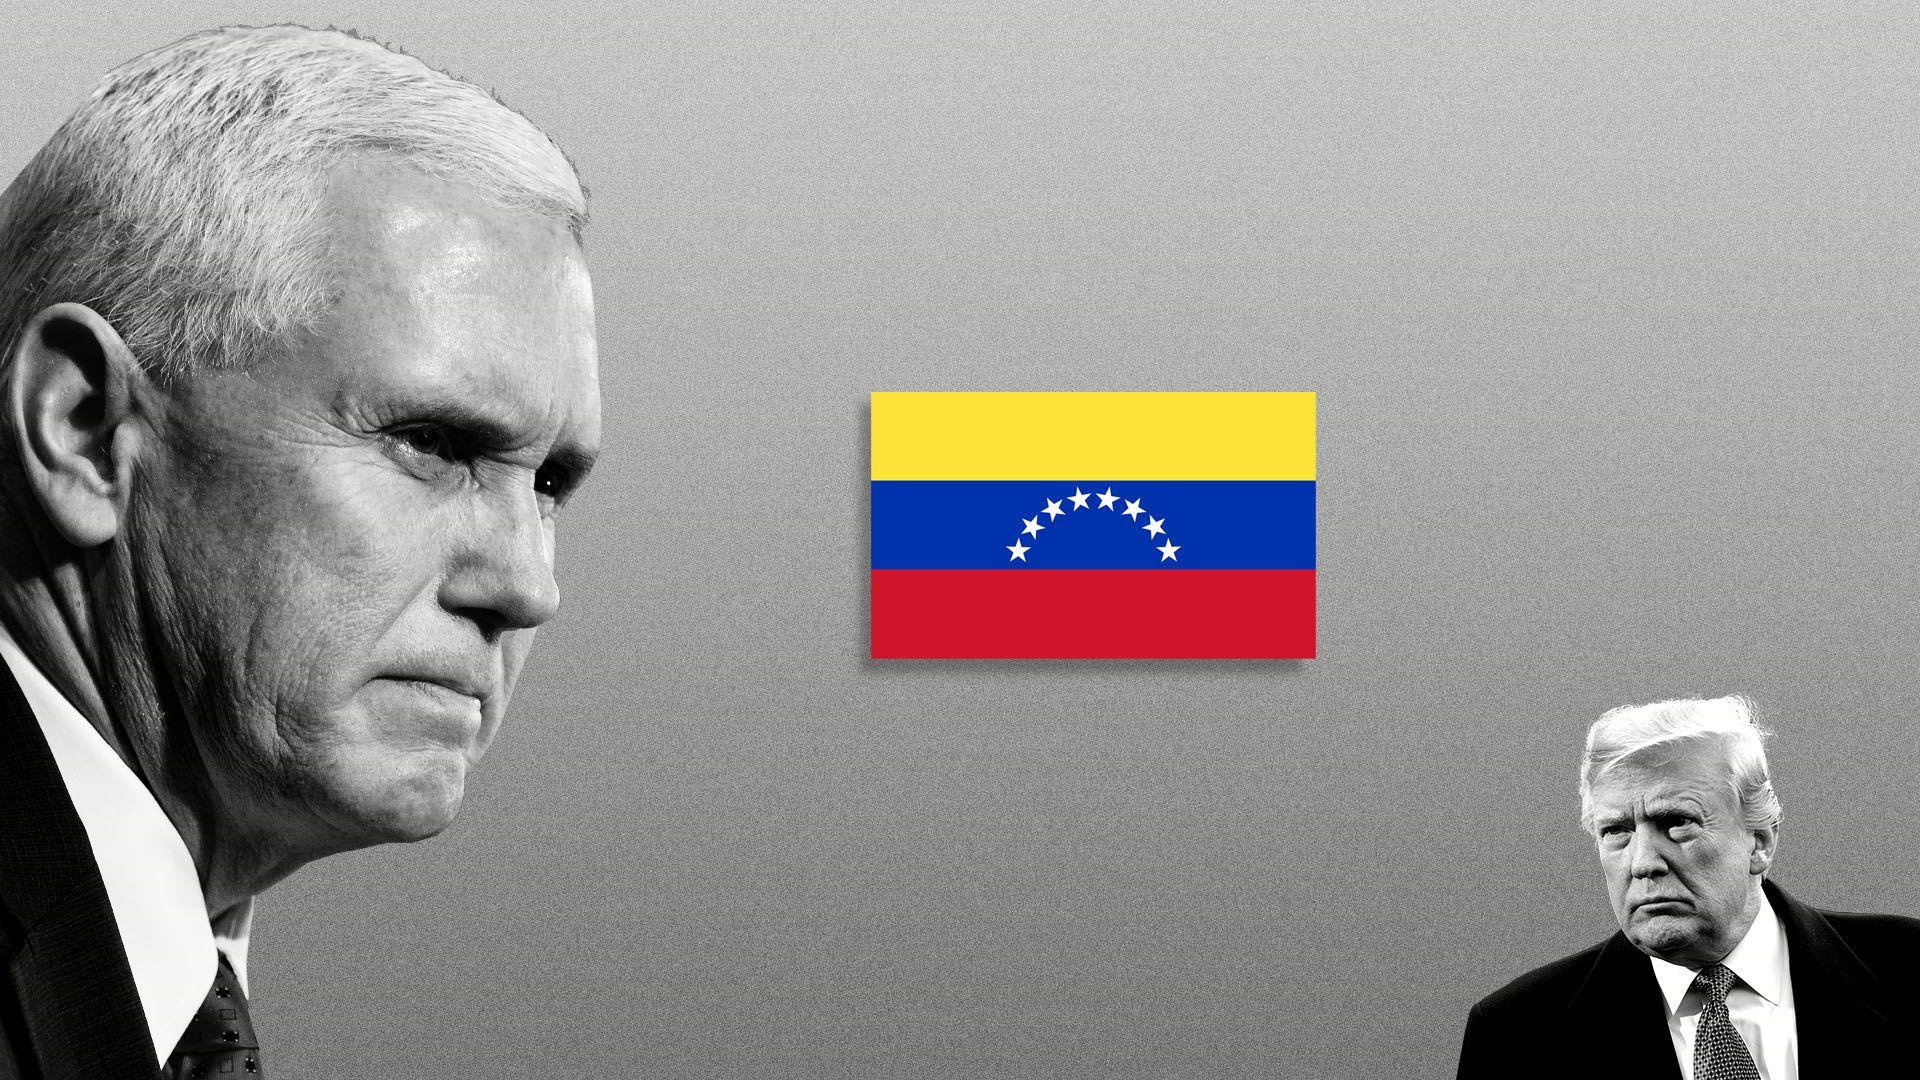 Illustration of Vice President Pence staring at Venezuelan flag